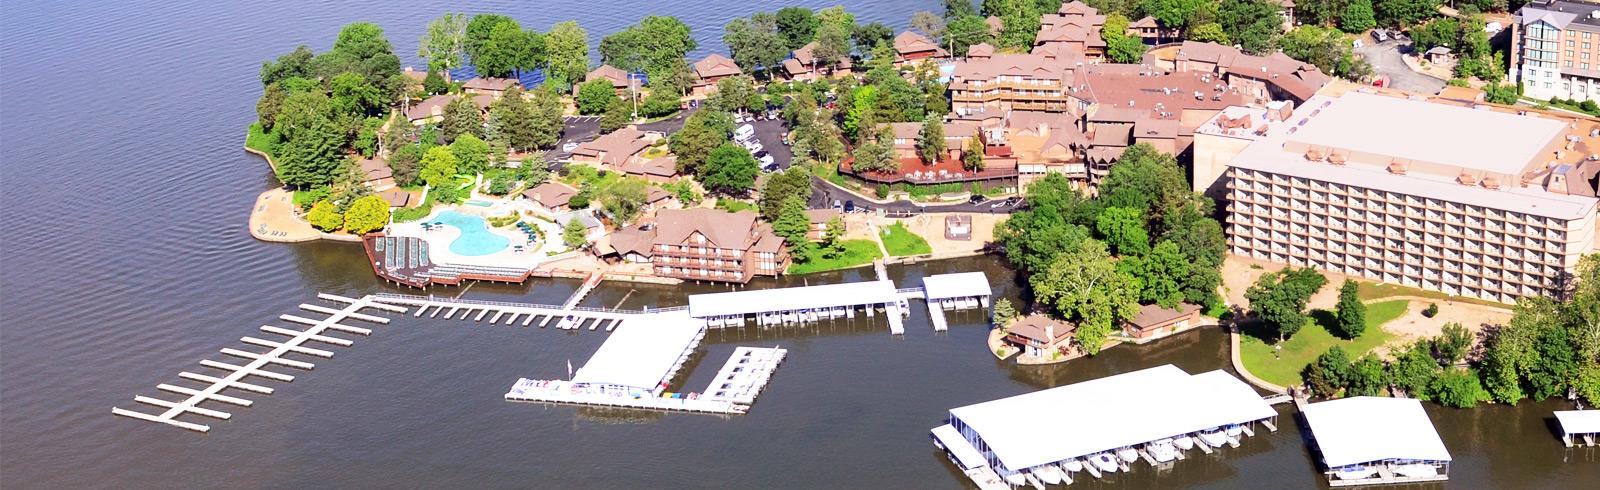 Aerial View of Margaritaville Lake Resort Lake of the Ozarks